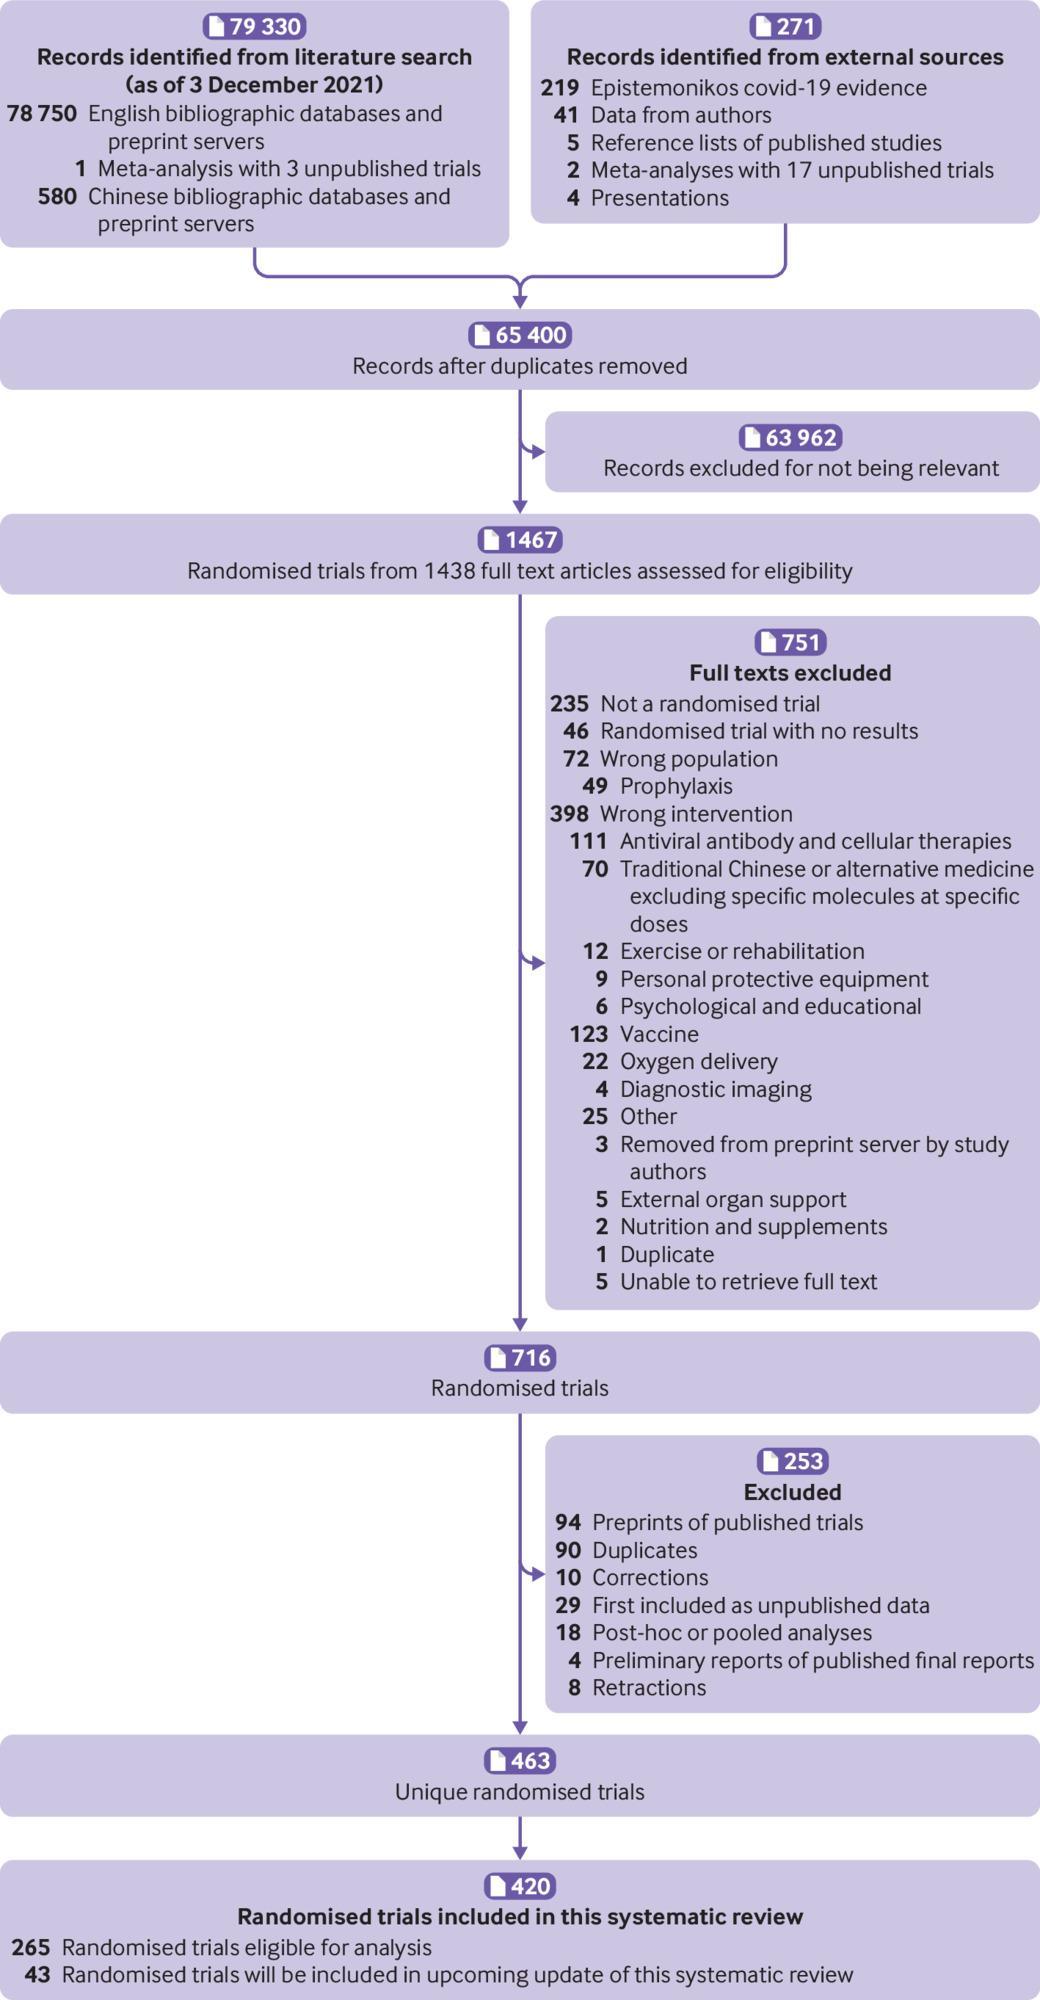 [BMJ论文]: 新冠病毒感染的药物治疗:动态系统回顾和网络meta分析